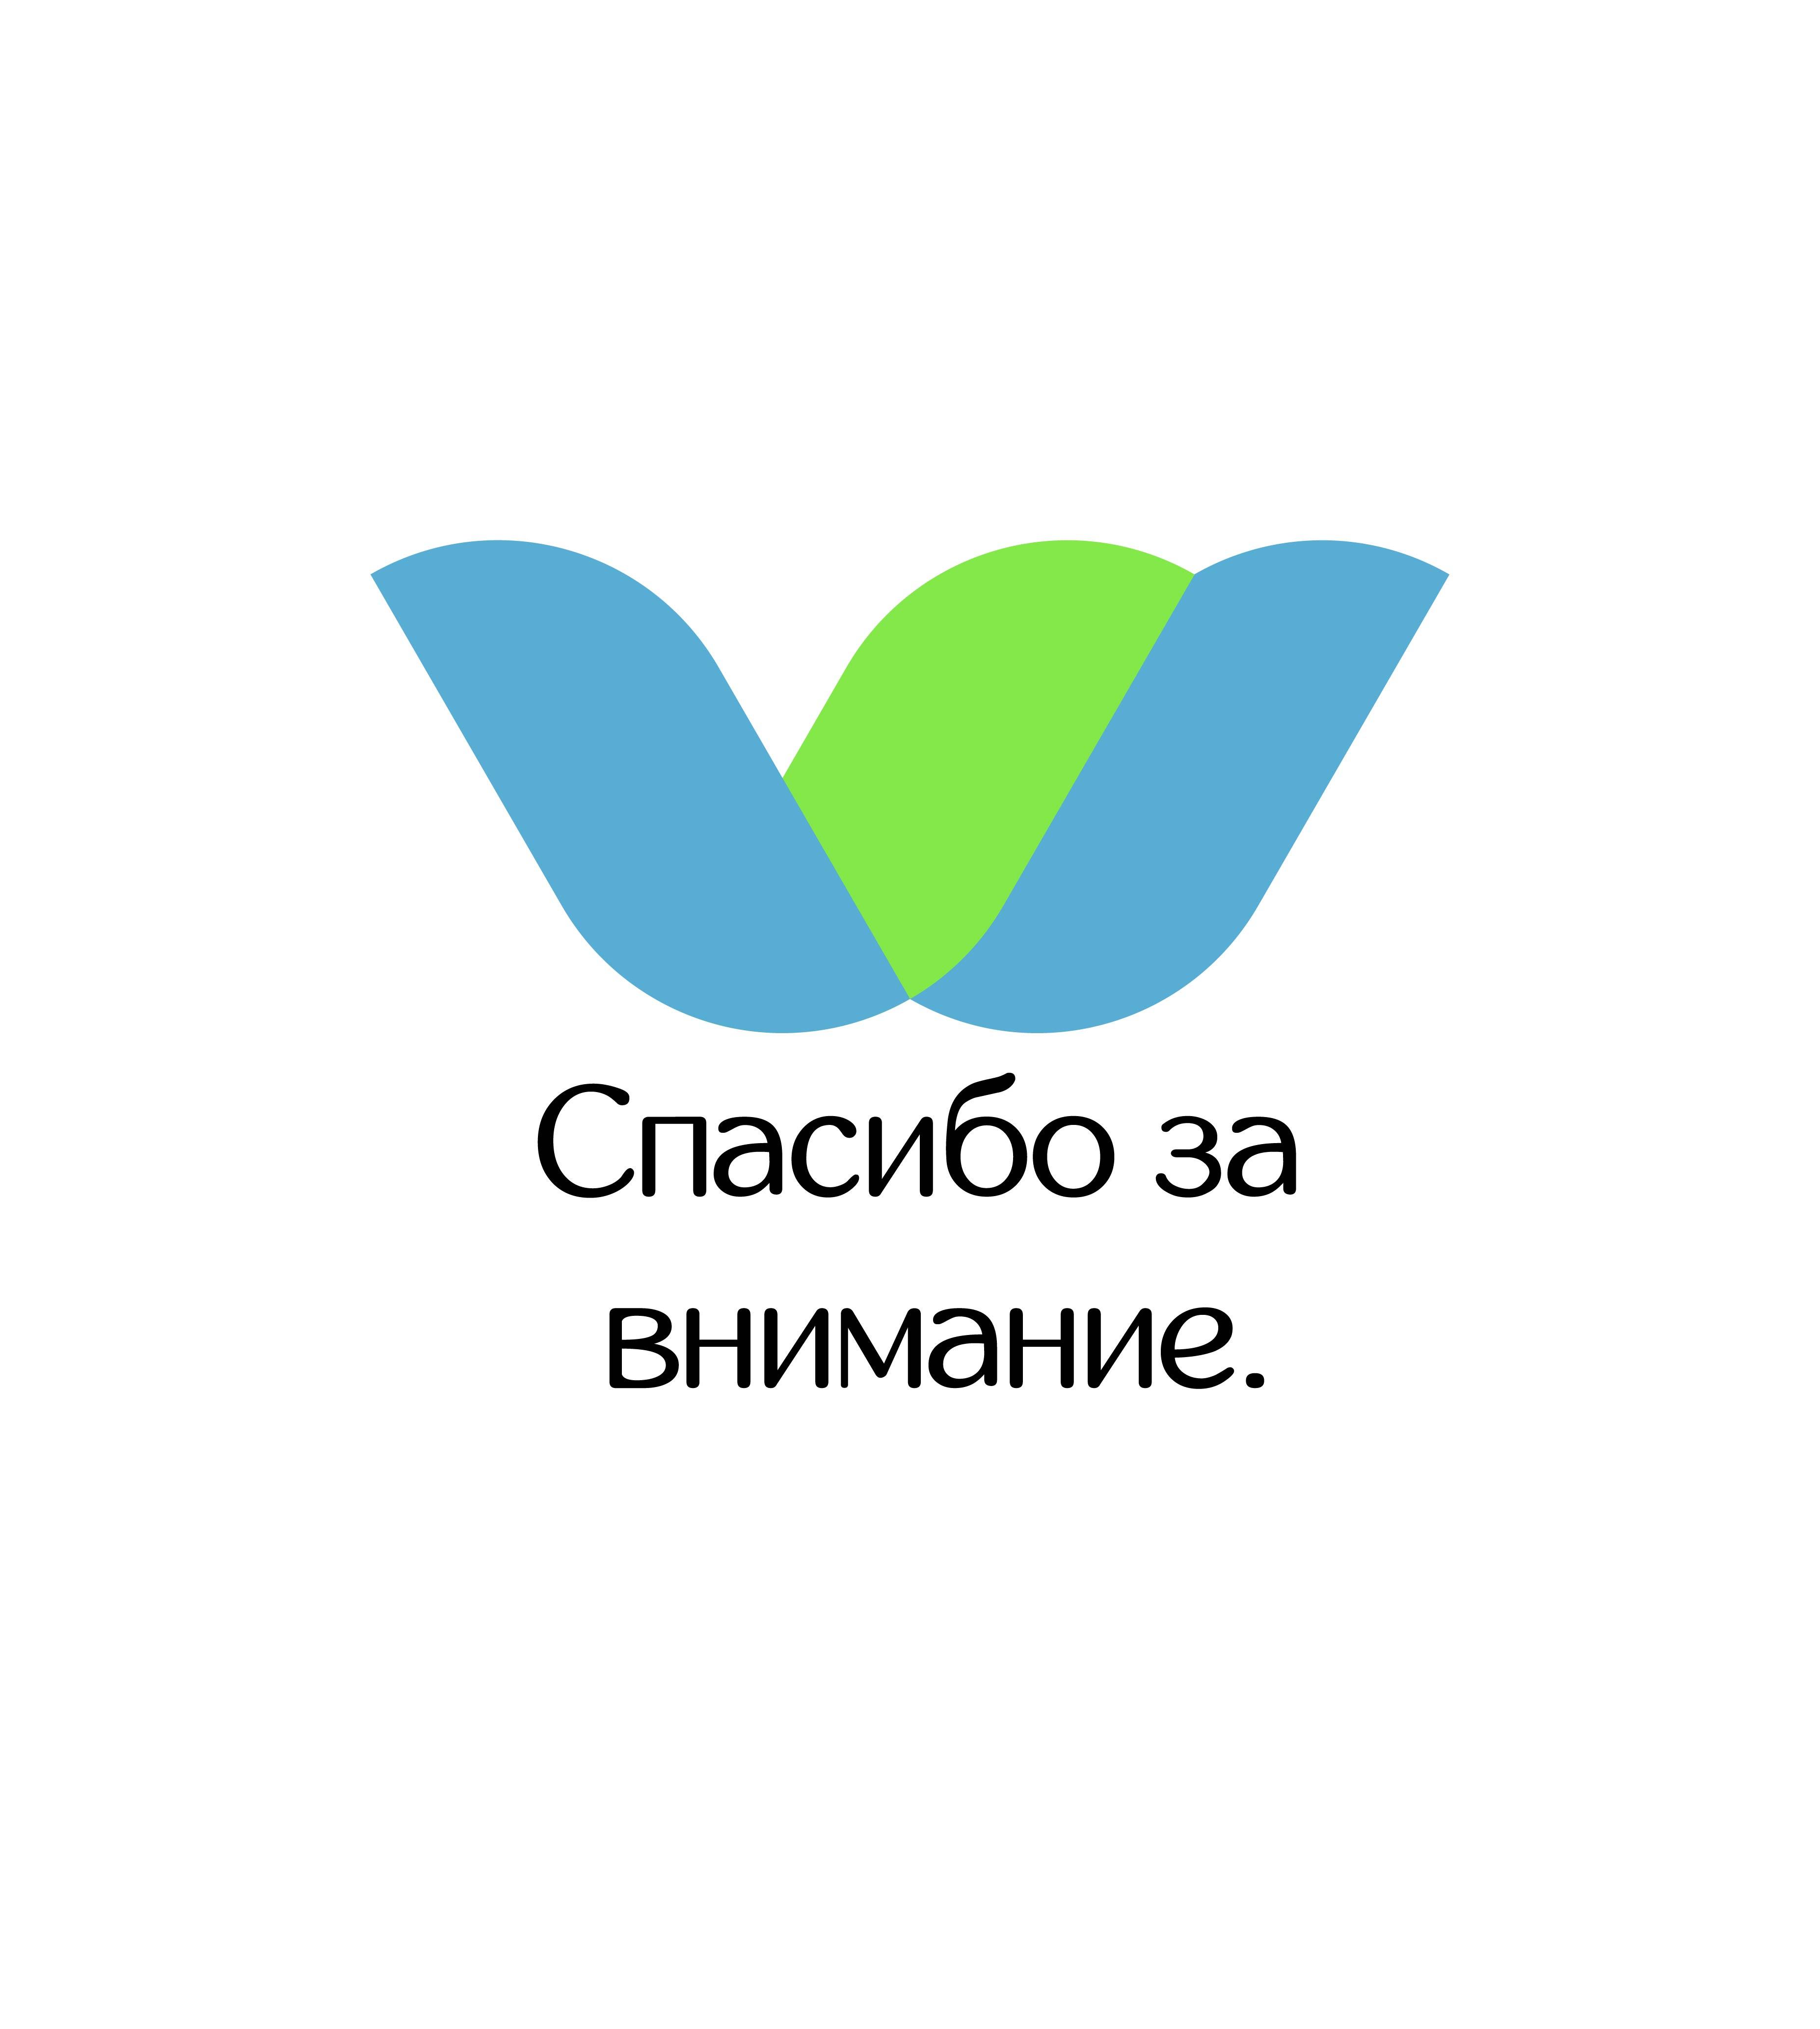 Логотип и фирменный стиль фото f_223595948ca6f690.jpg